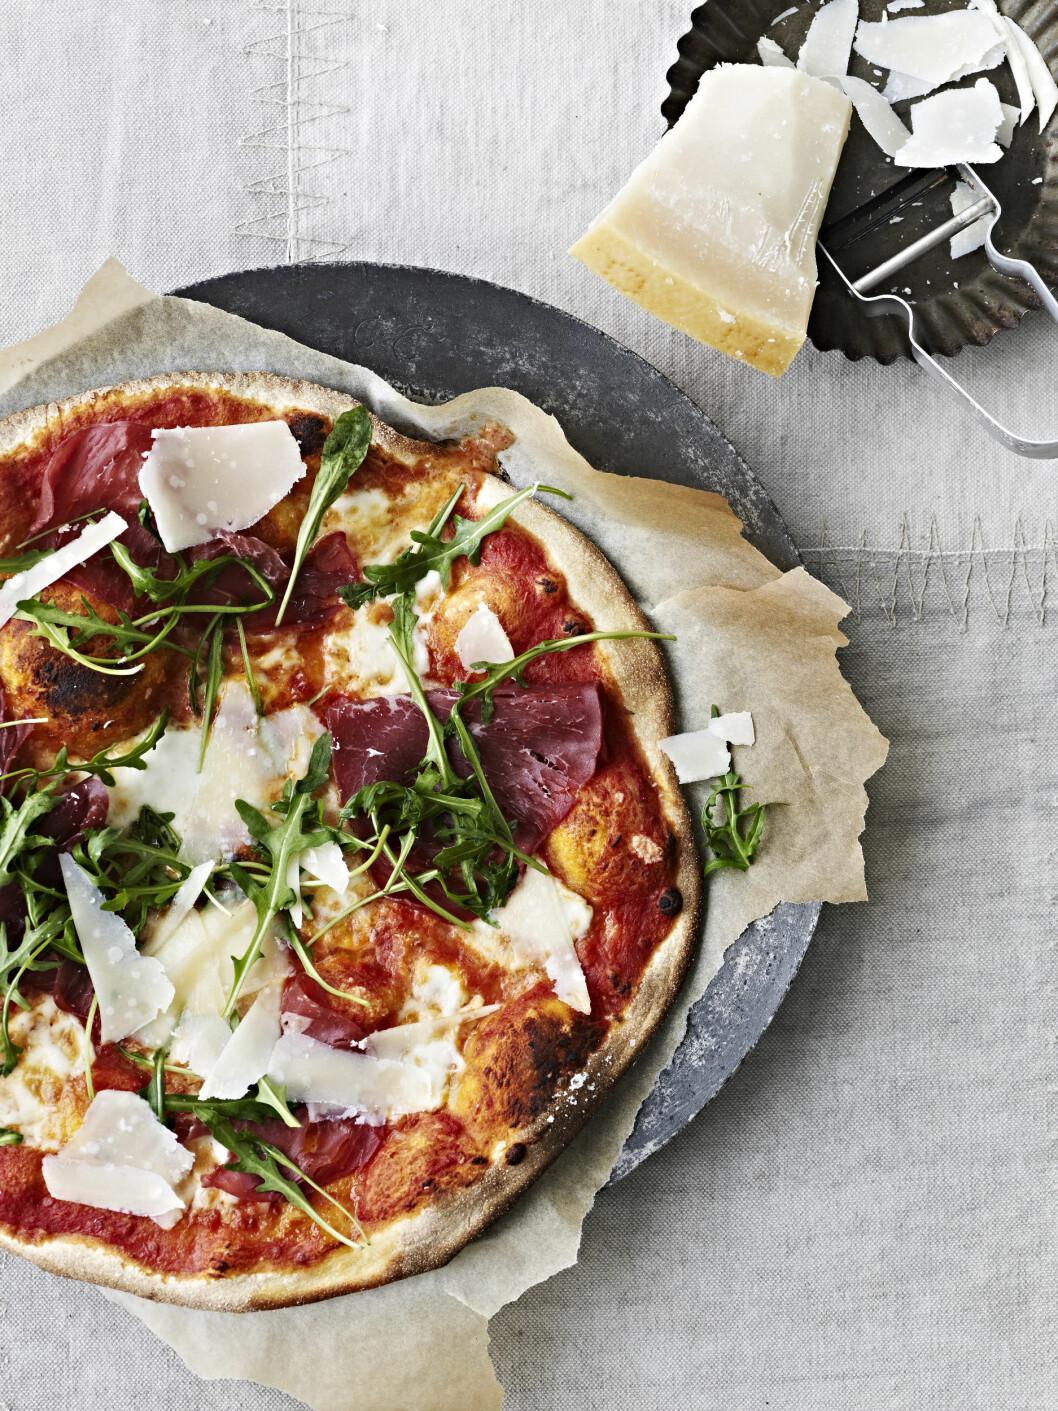 TORSDAGSPIZZA: Denne spennende pizzaen vil være til glede for hele familien!  Foto: All Over Press